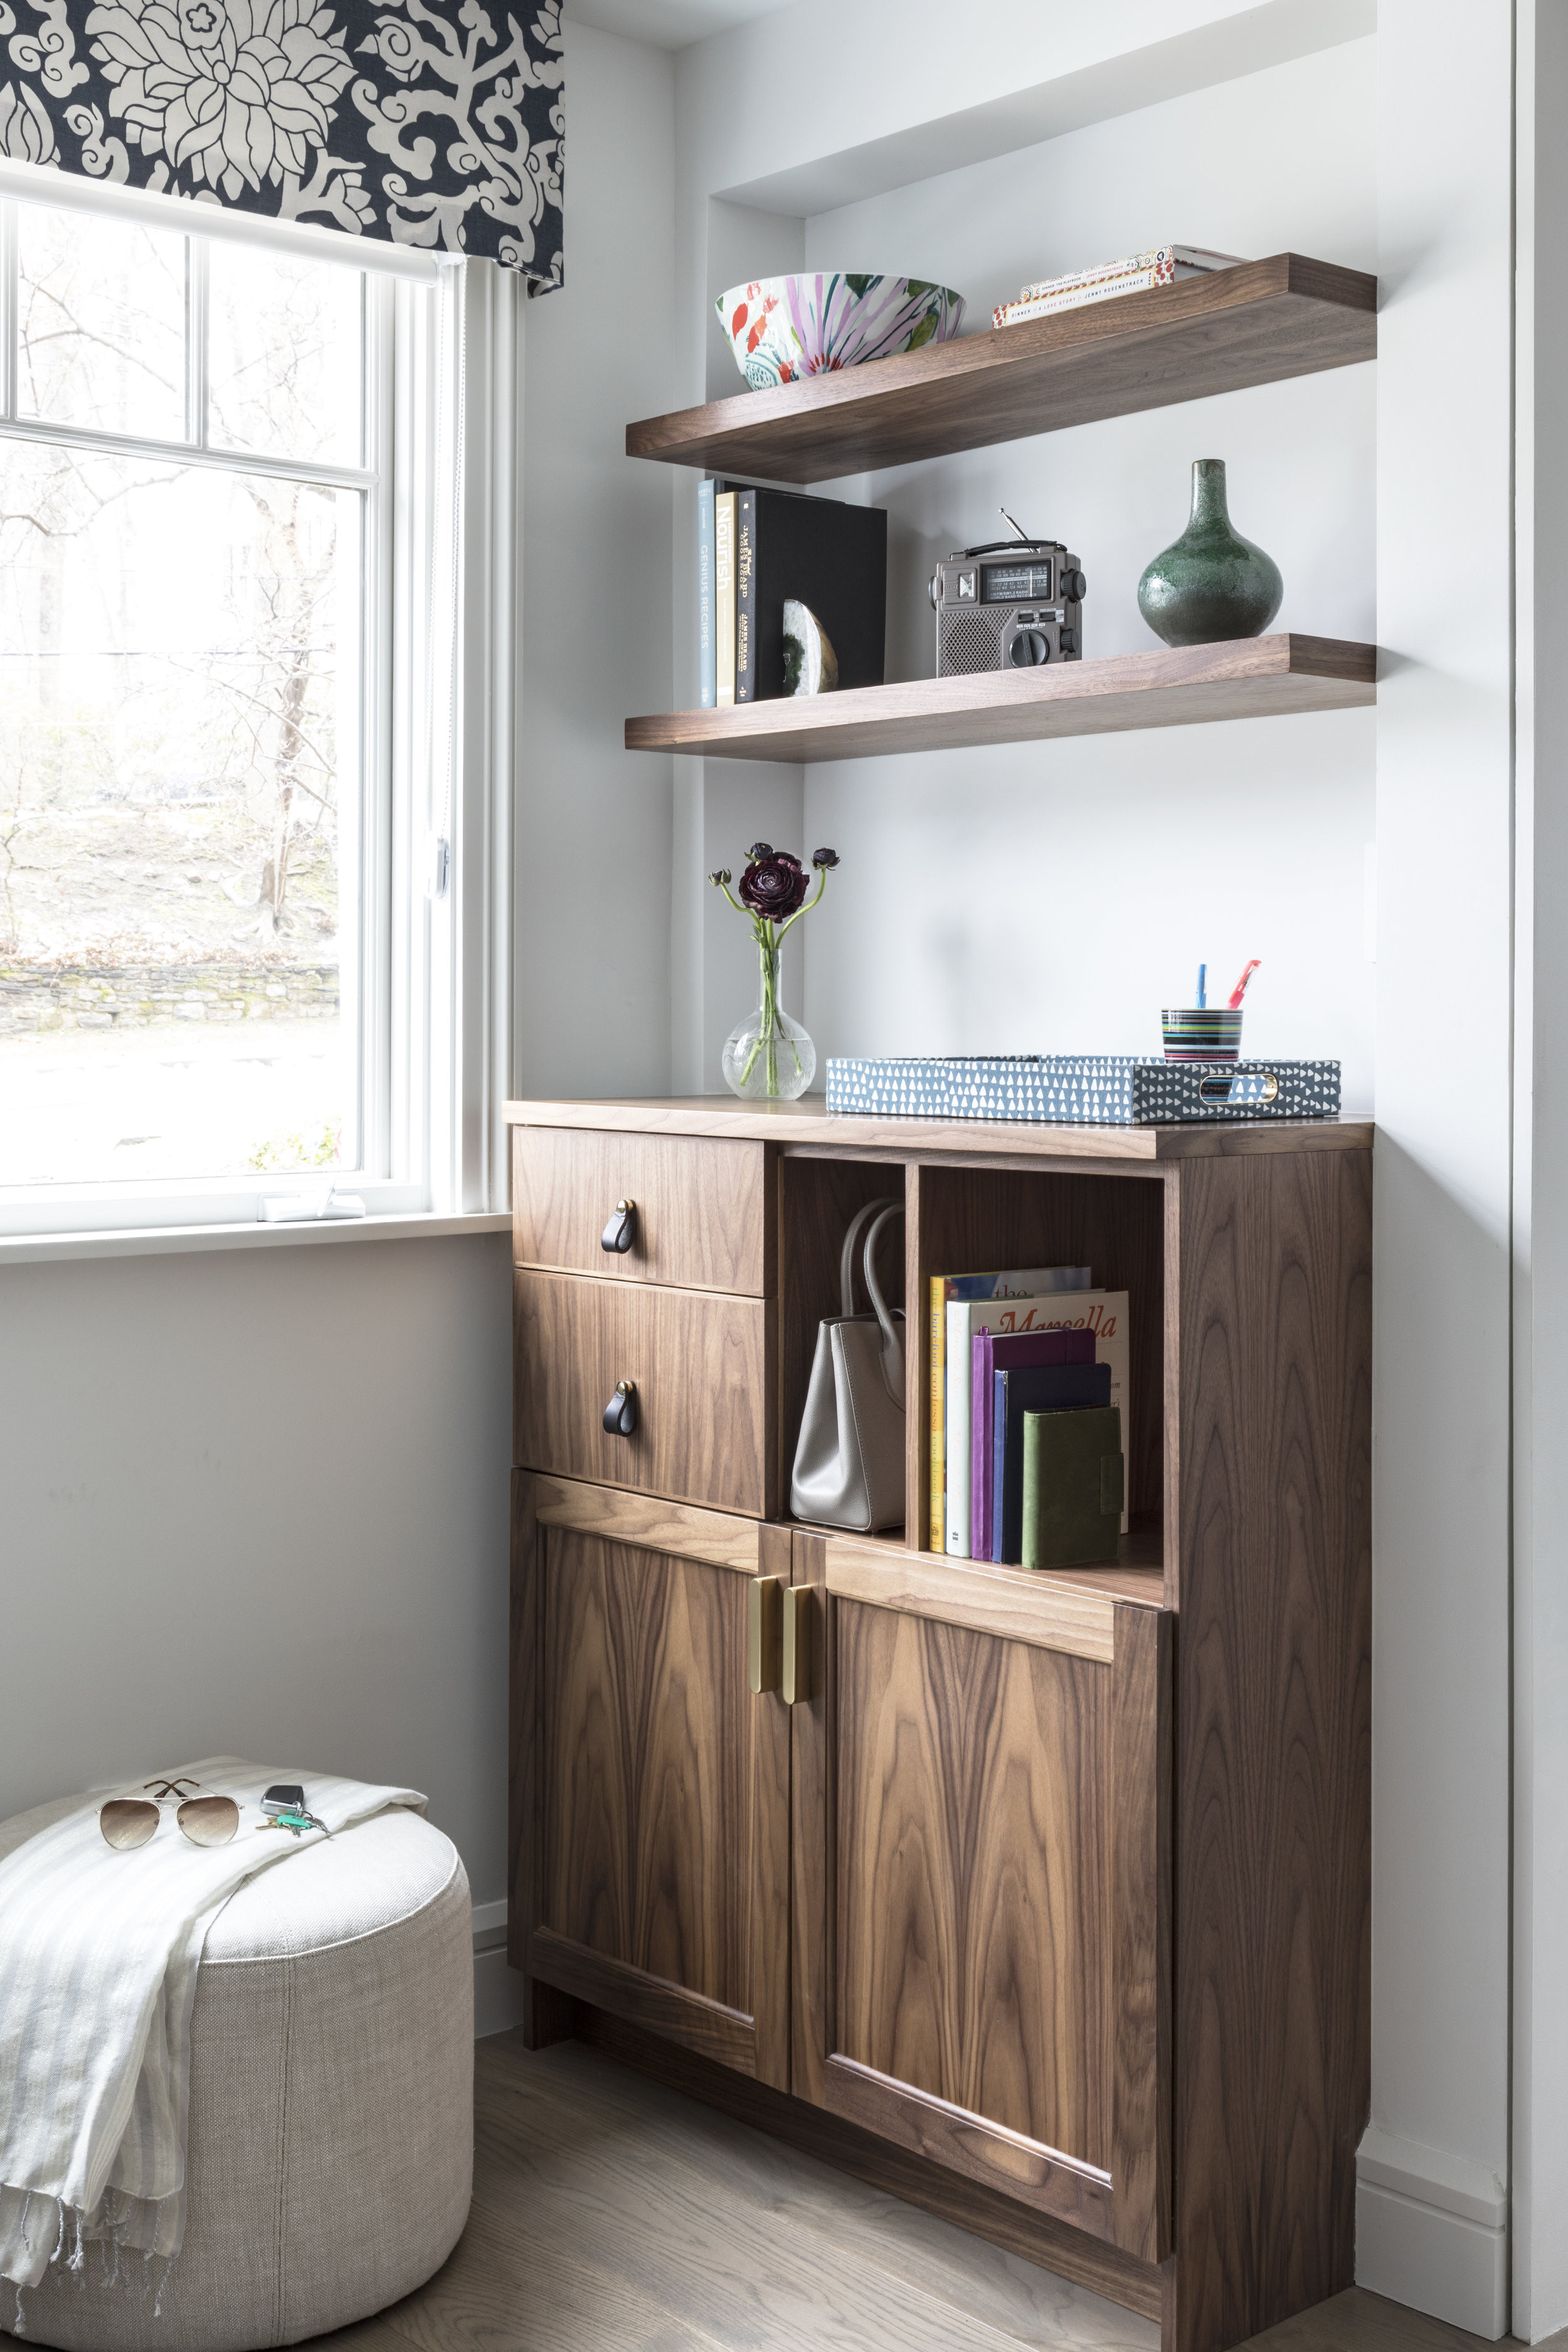 Custom-Wood-Entry-Console-Organizer-Charging-Station-Jmorris-Design-Interior-Designer-Brooklyn-Online-Edesign.jpg